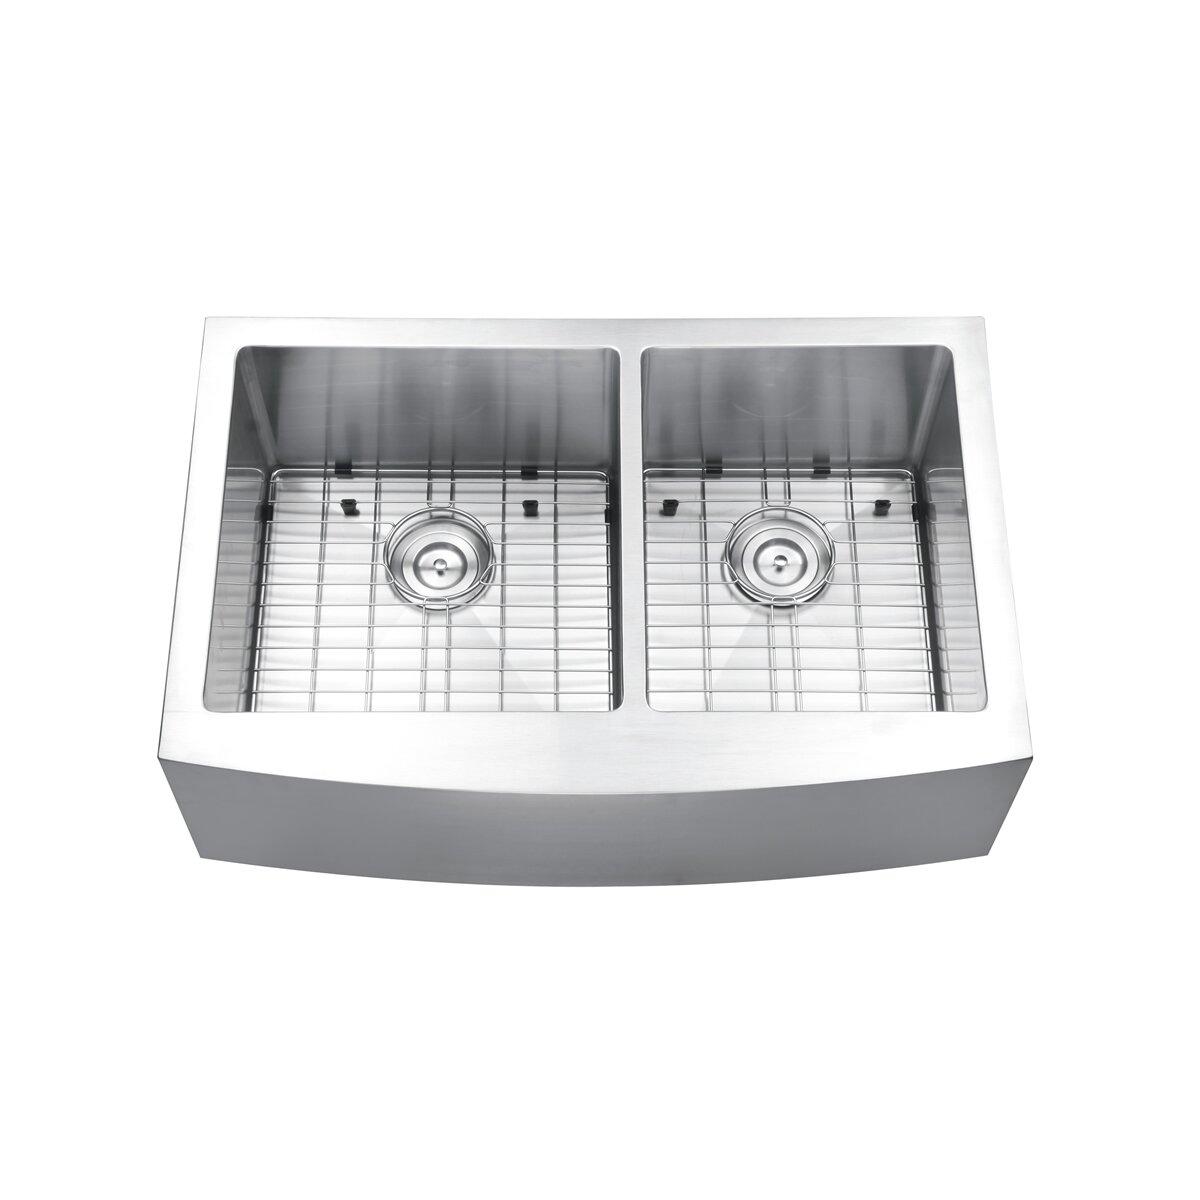 Apron Front Kitchen Sink Double Bowl : Ruvati Verona 33